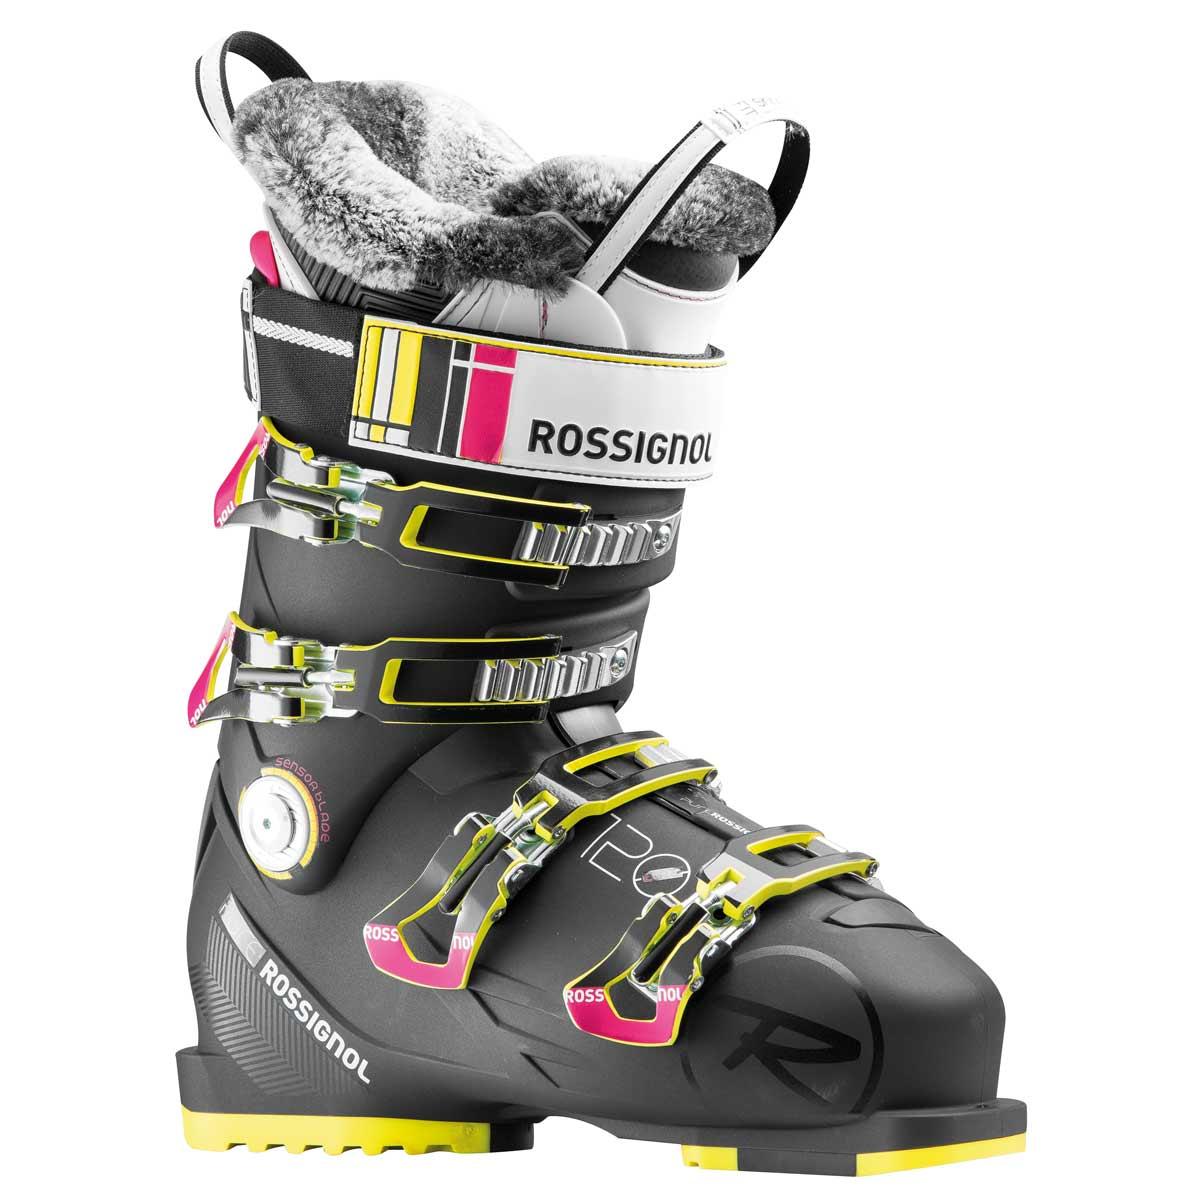 Rossignol Women's Pure Elite 120 Ski Boots On Sale